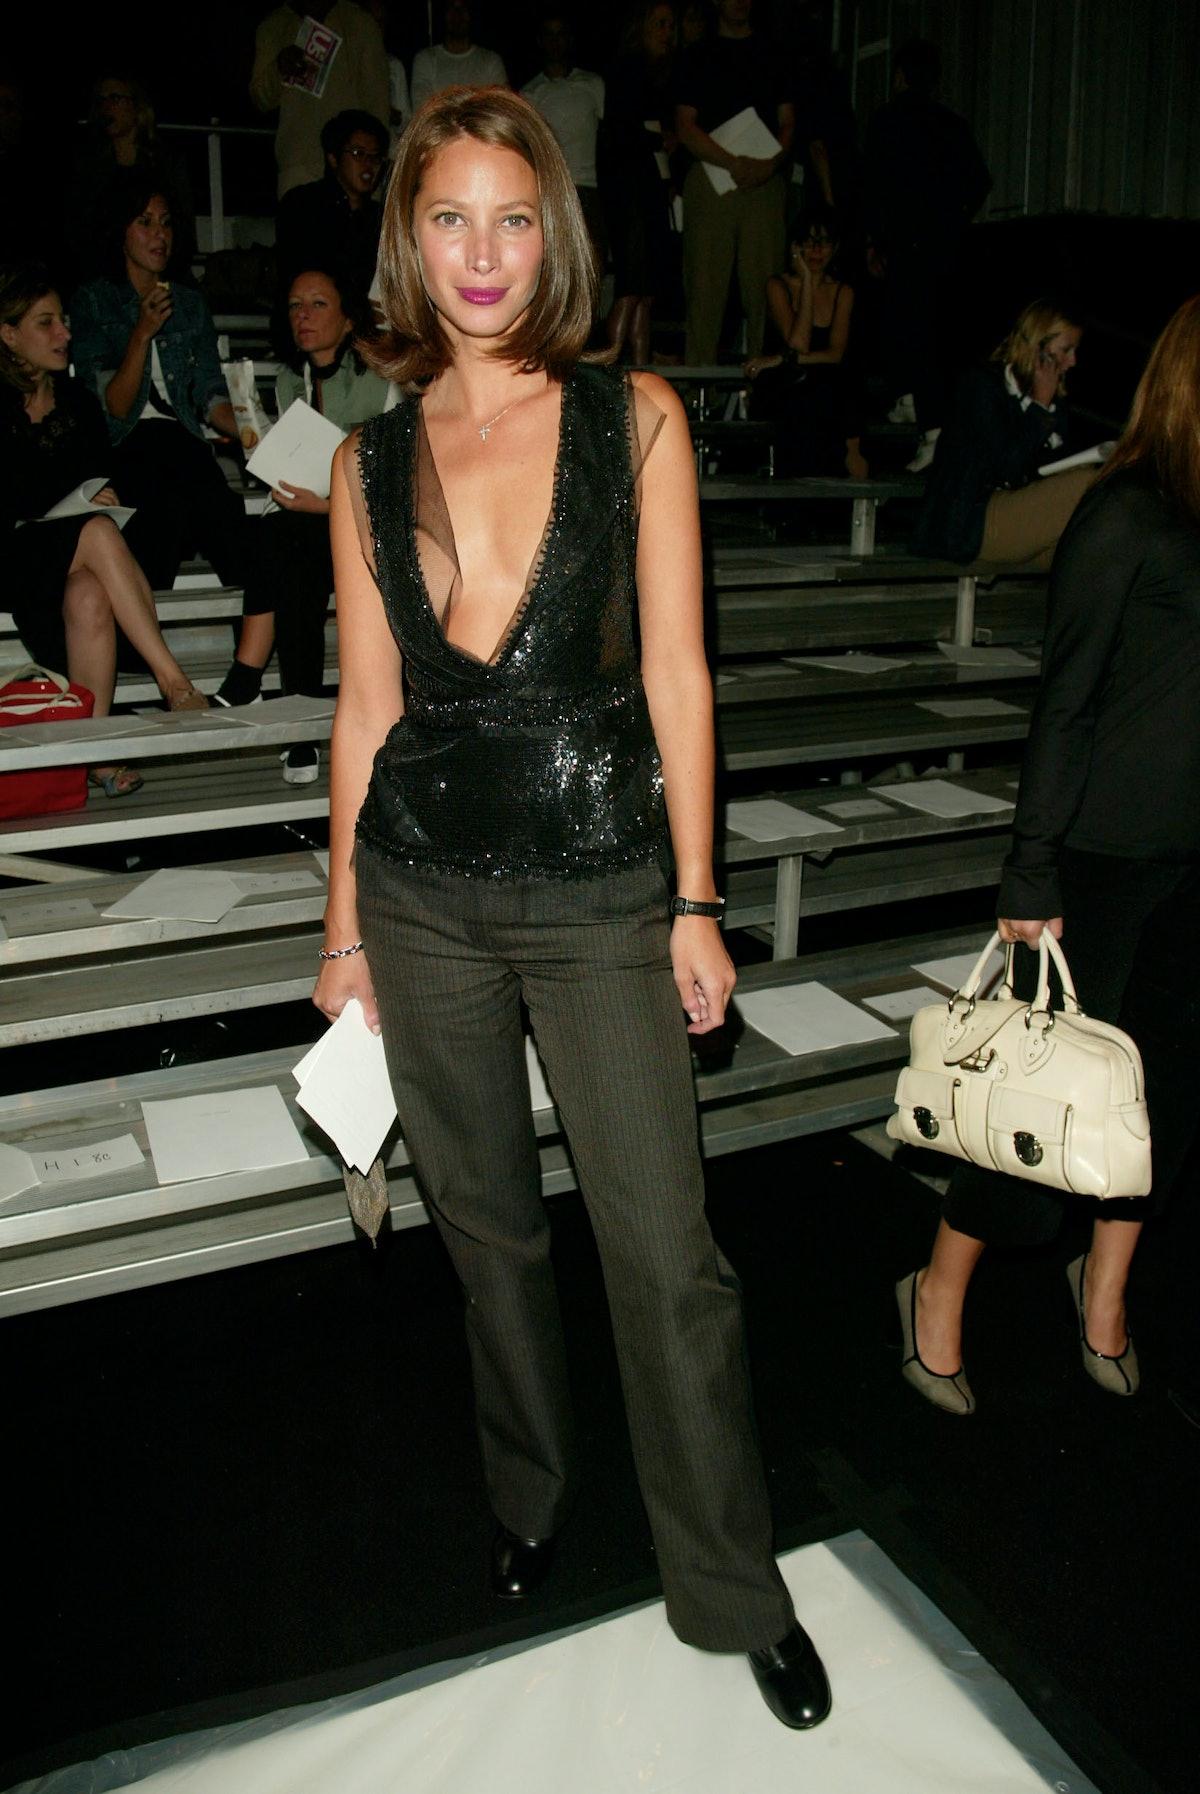 Mercedes-Benz Fashion Week: Marc Jacobs Spring 2003